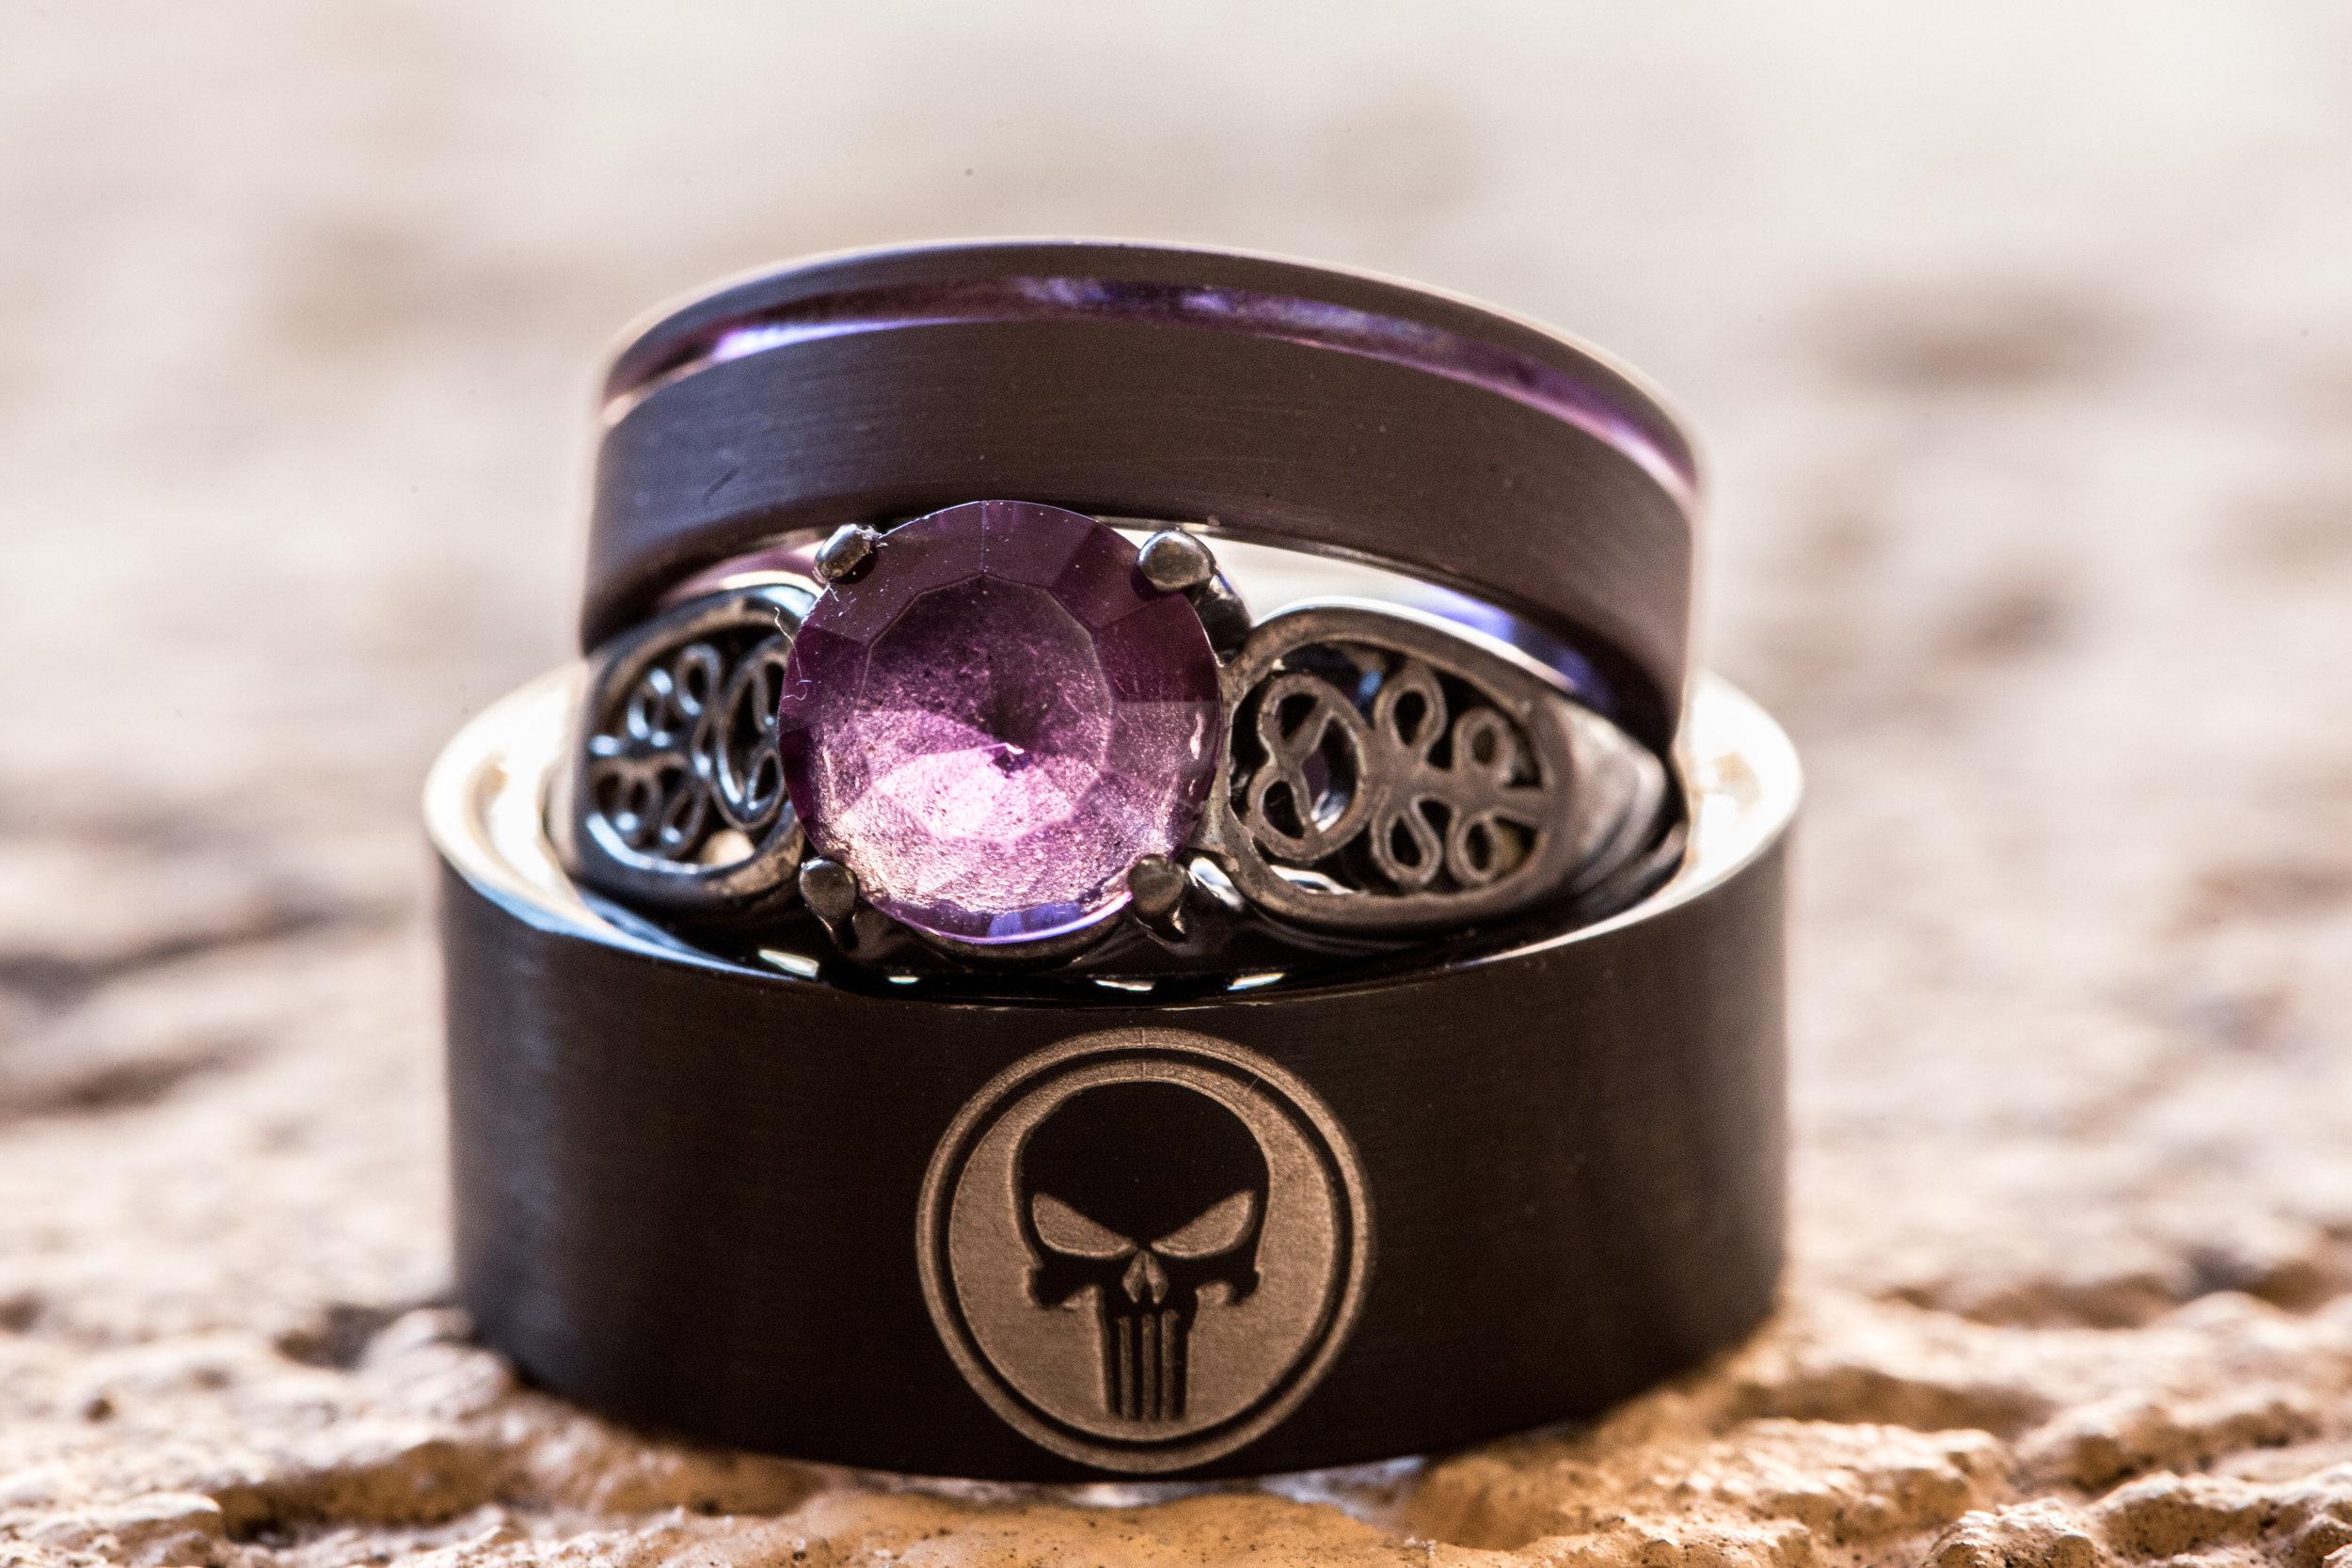 Detail of the punisher wedding rings by the Atlanta Wedding Photographers at AtlantaArtisticWeddings